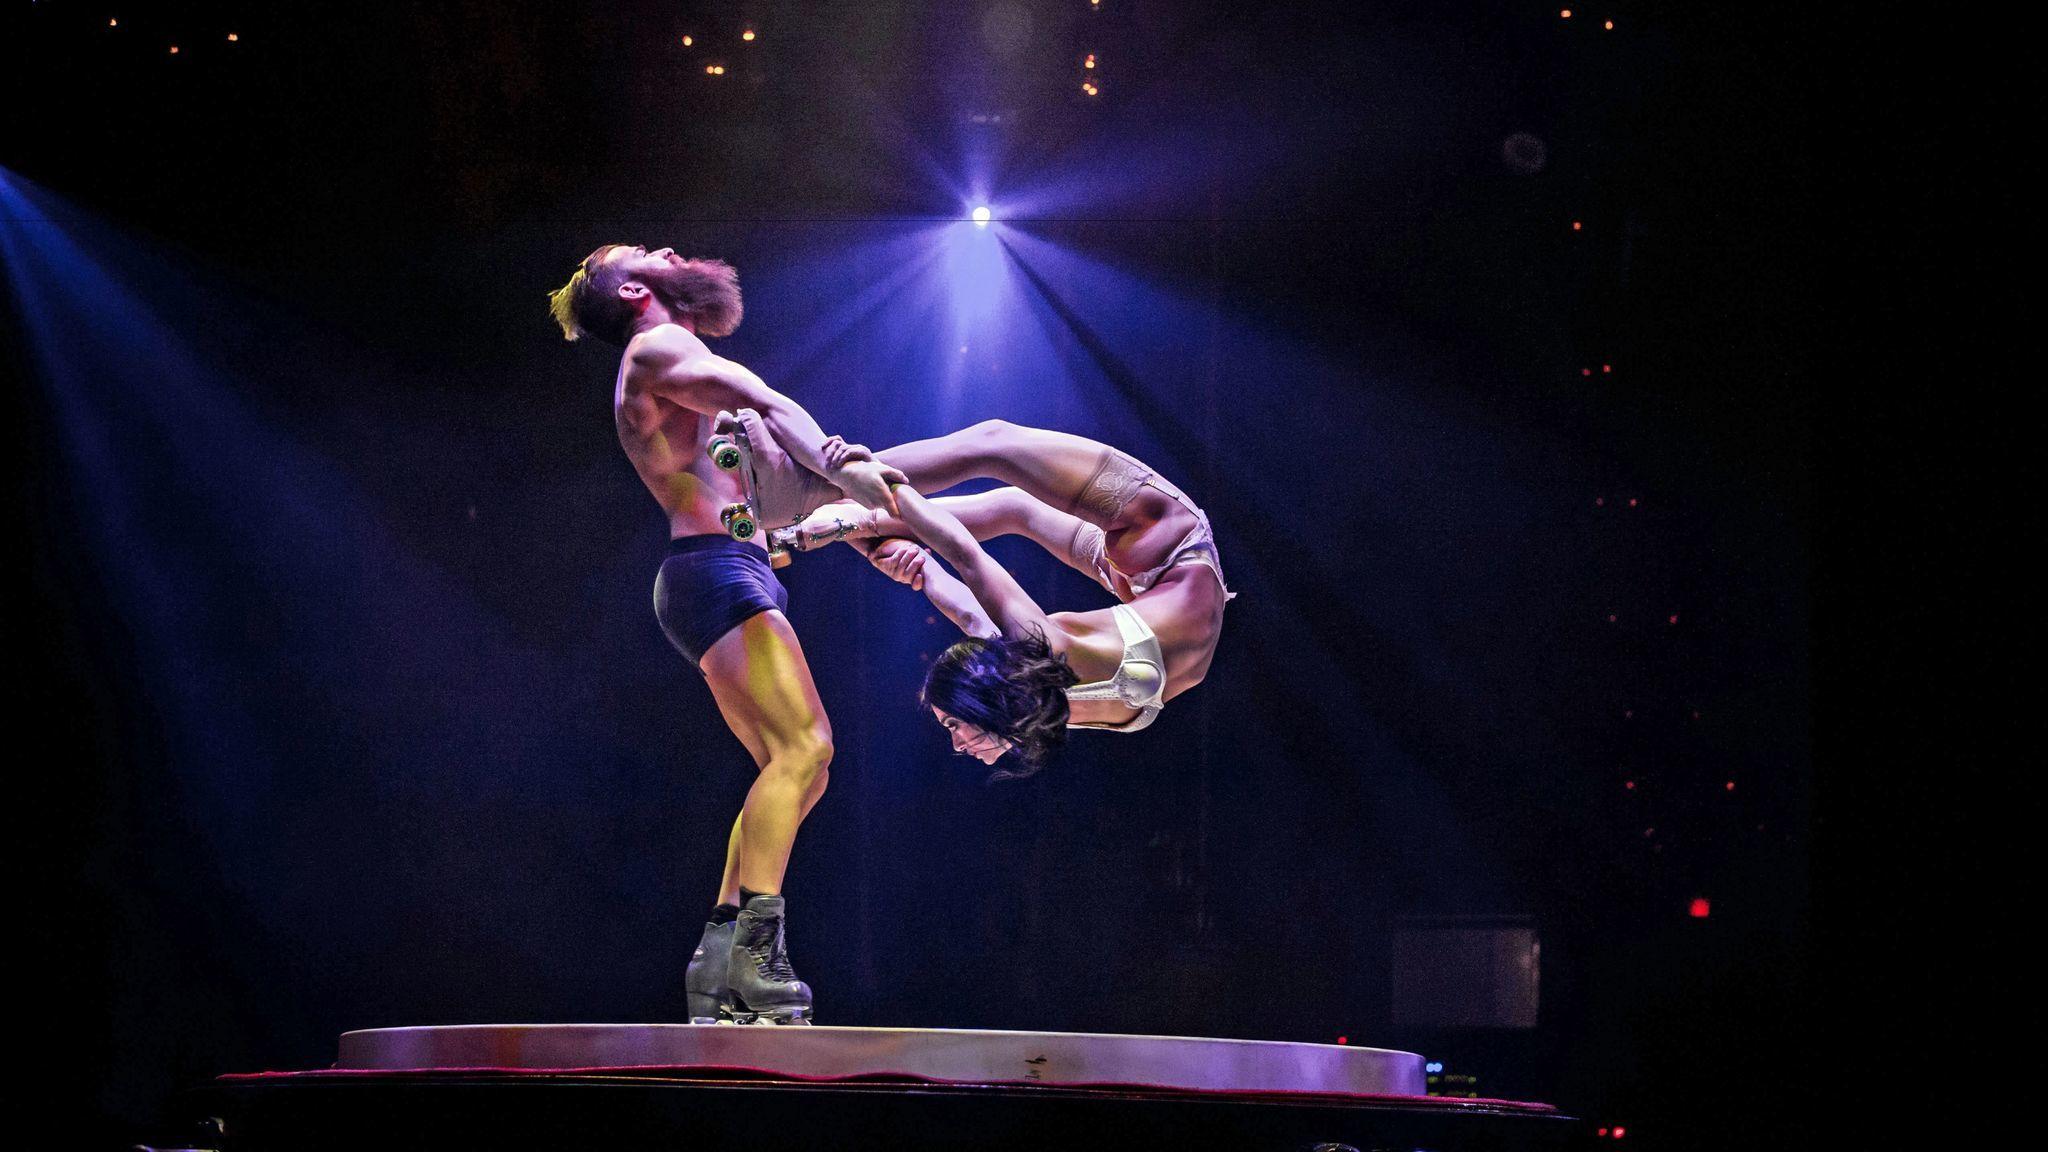 Acrobatics, stripping and skating.